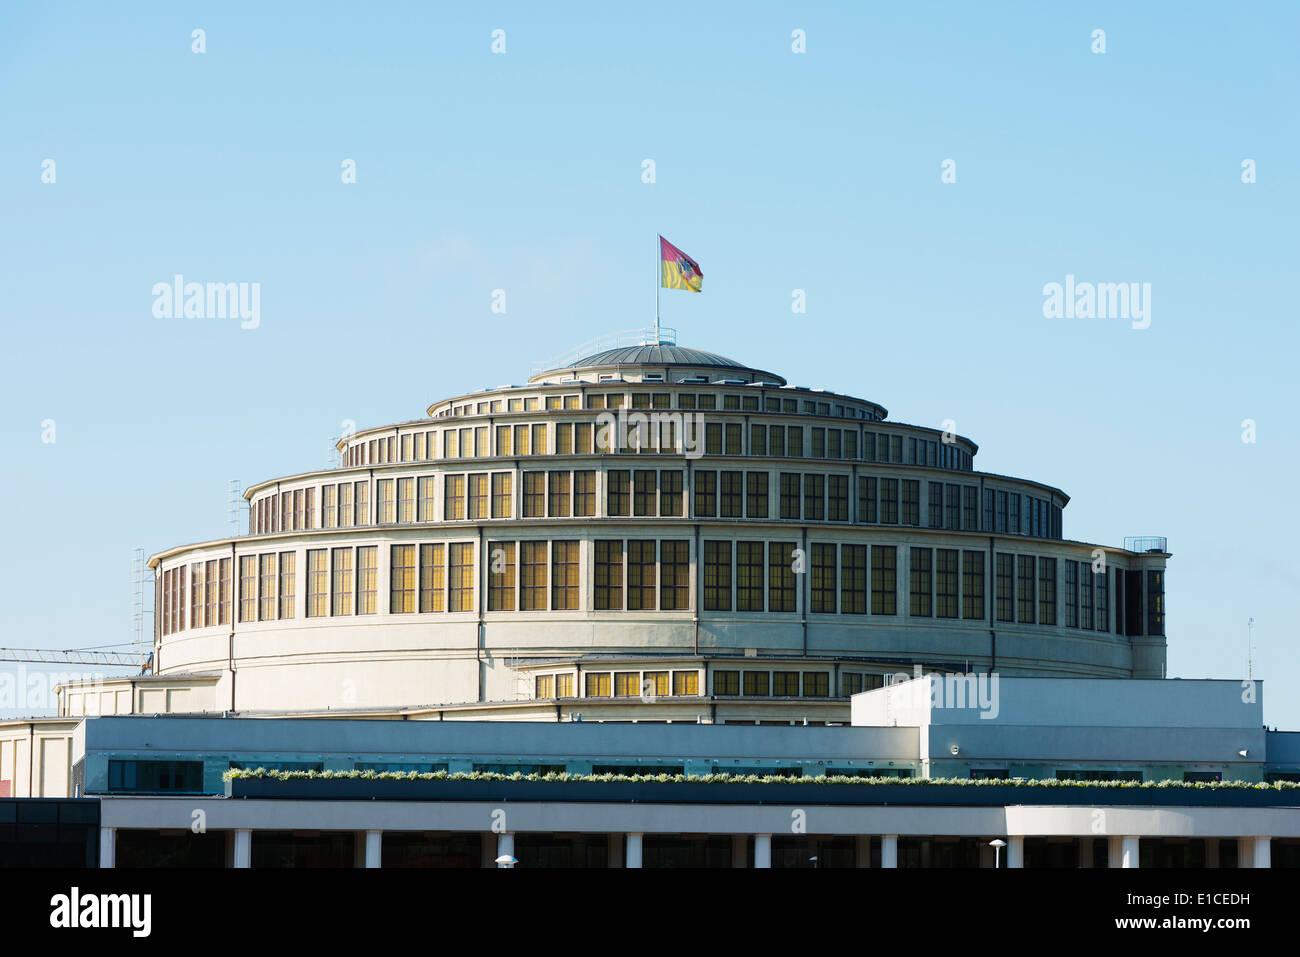 Europe, Poland, Silesia, Wroclaw, Centennial Hall, Unesco - Stock Image